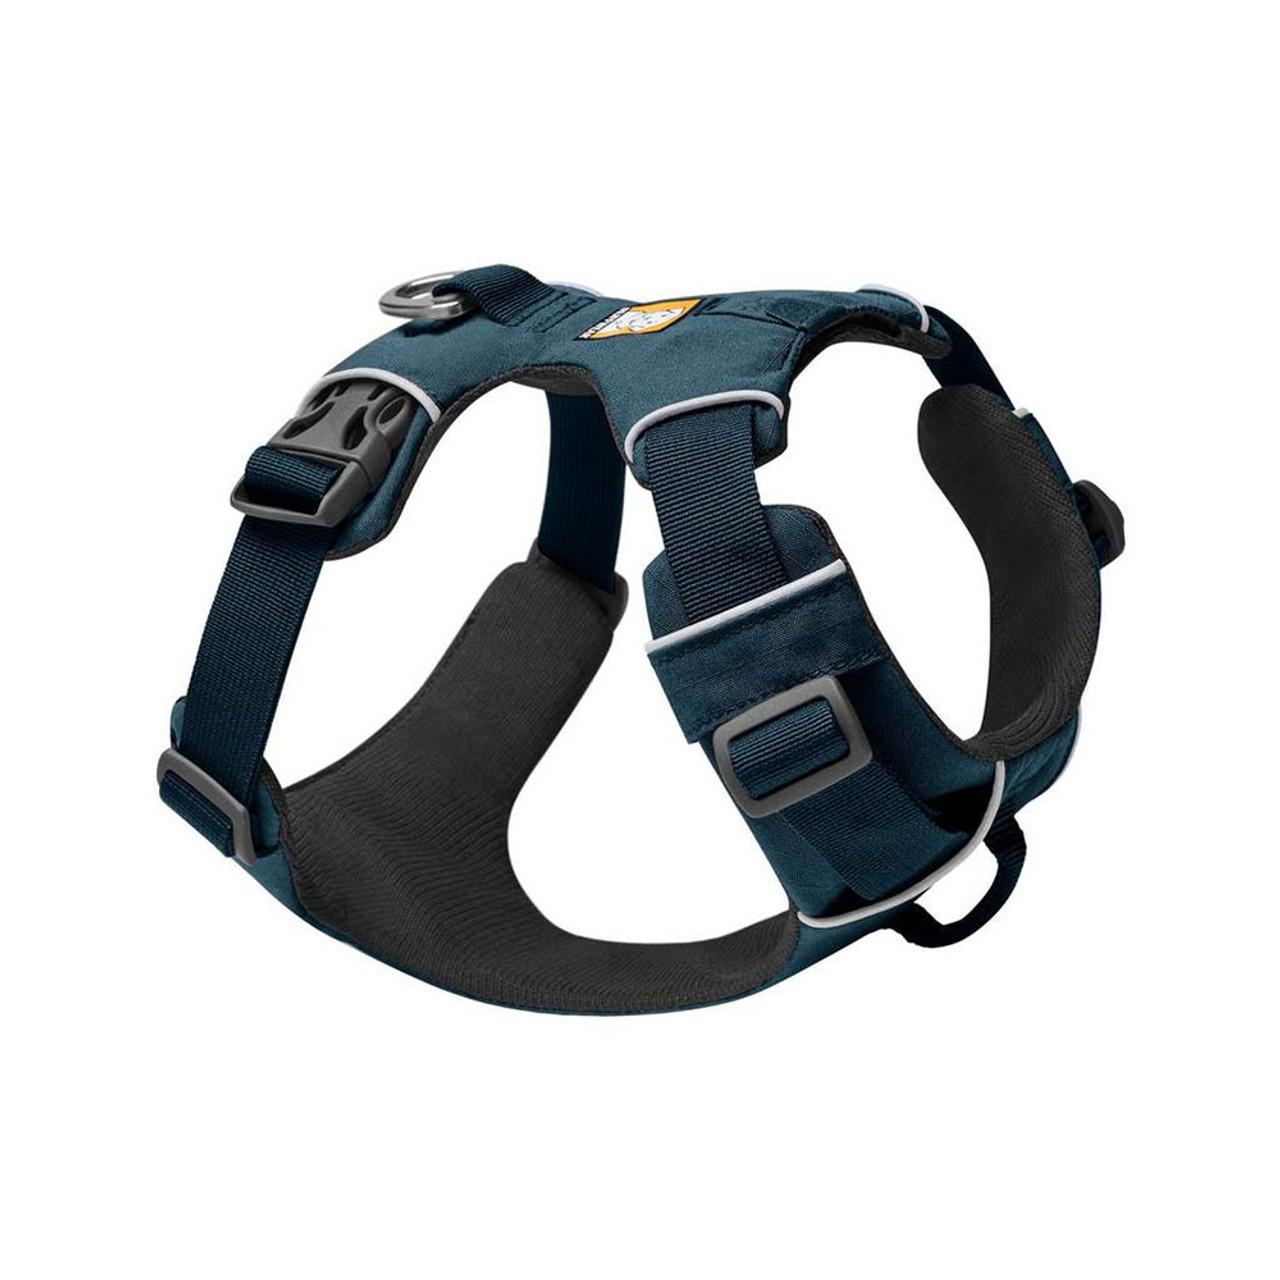 RuffWear Front Range Dog Harness - Front, Blue Moon